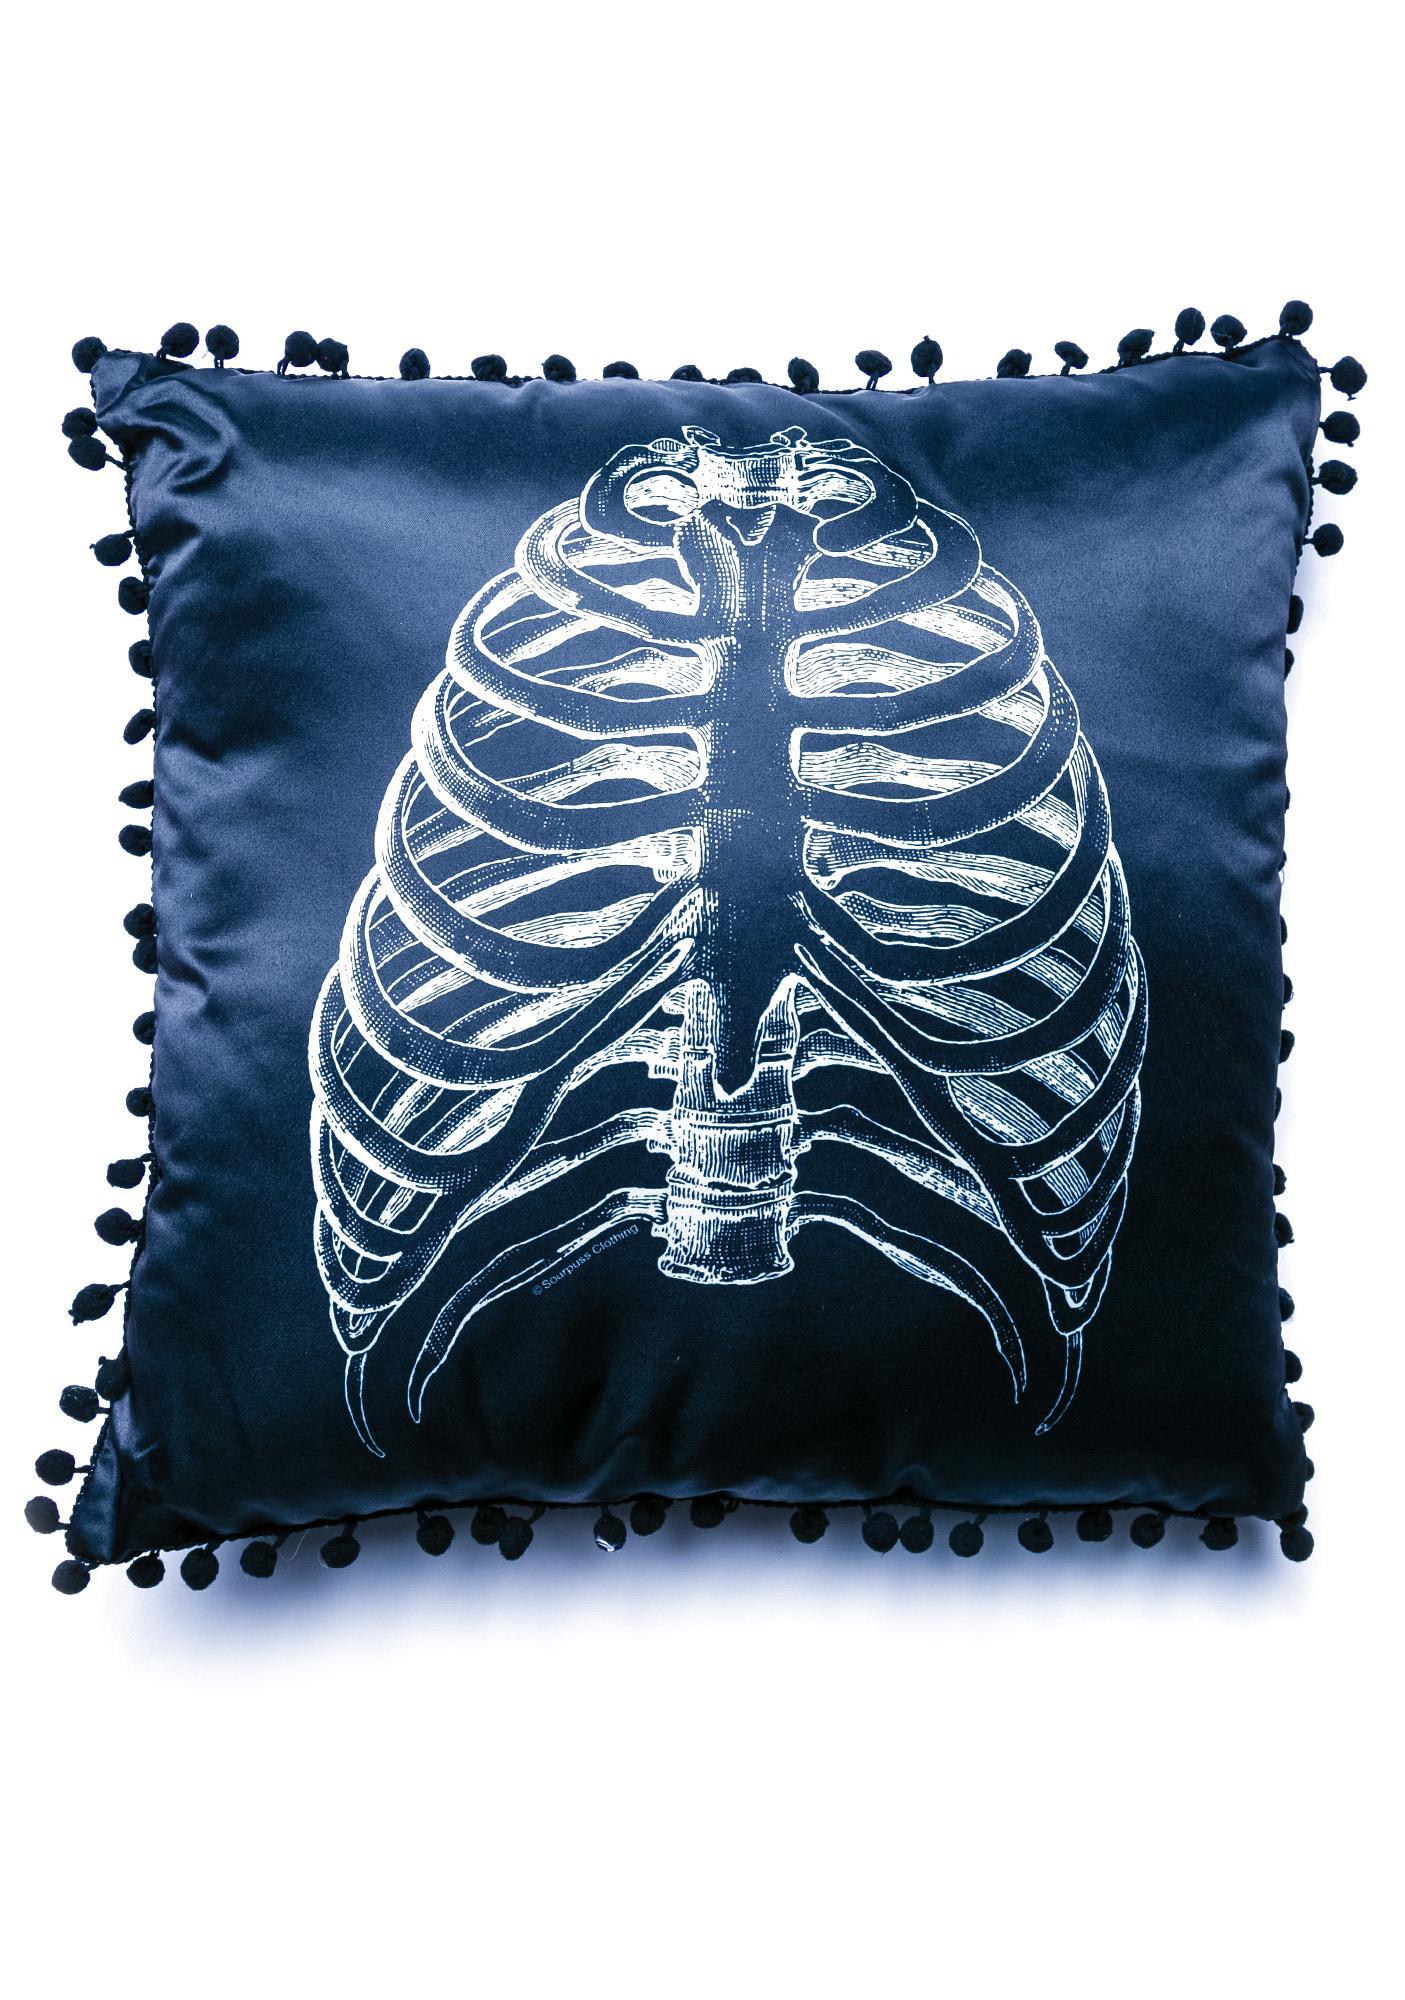 Sourpuss Clothing Anatomical Ribs Pillow